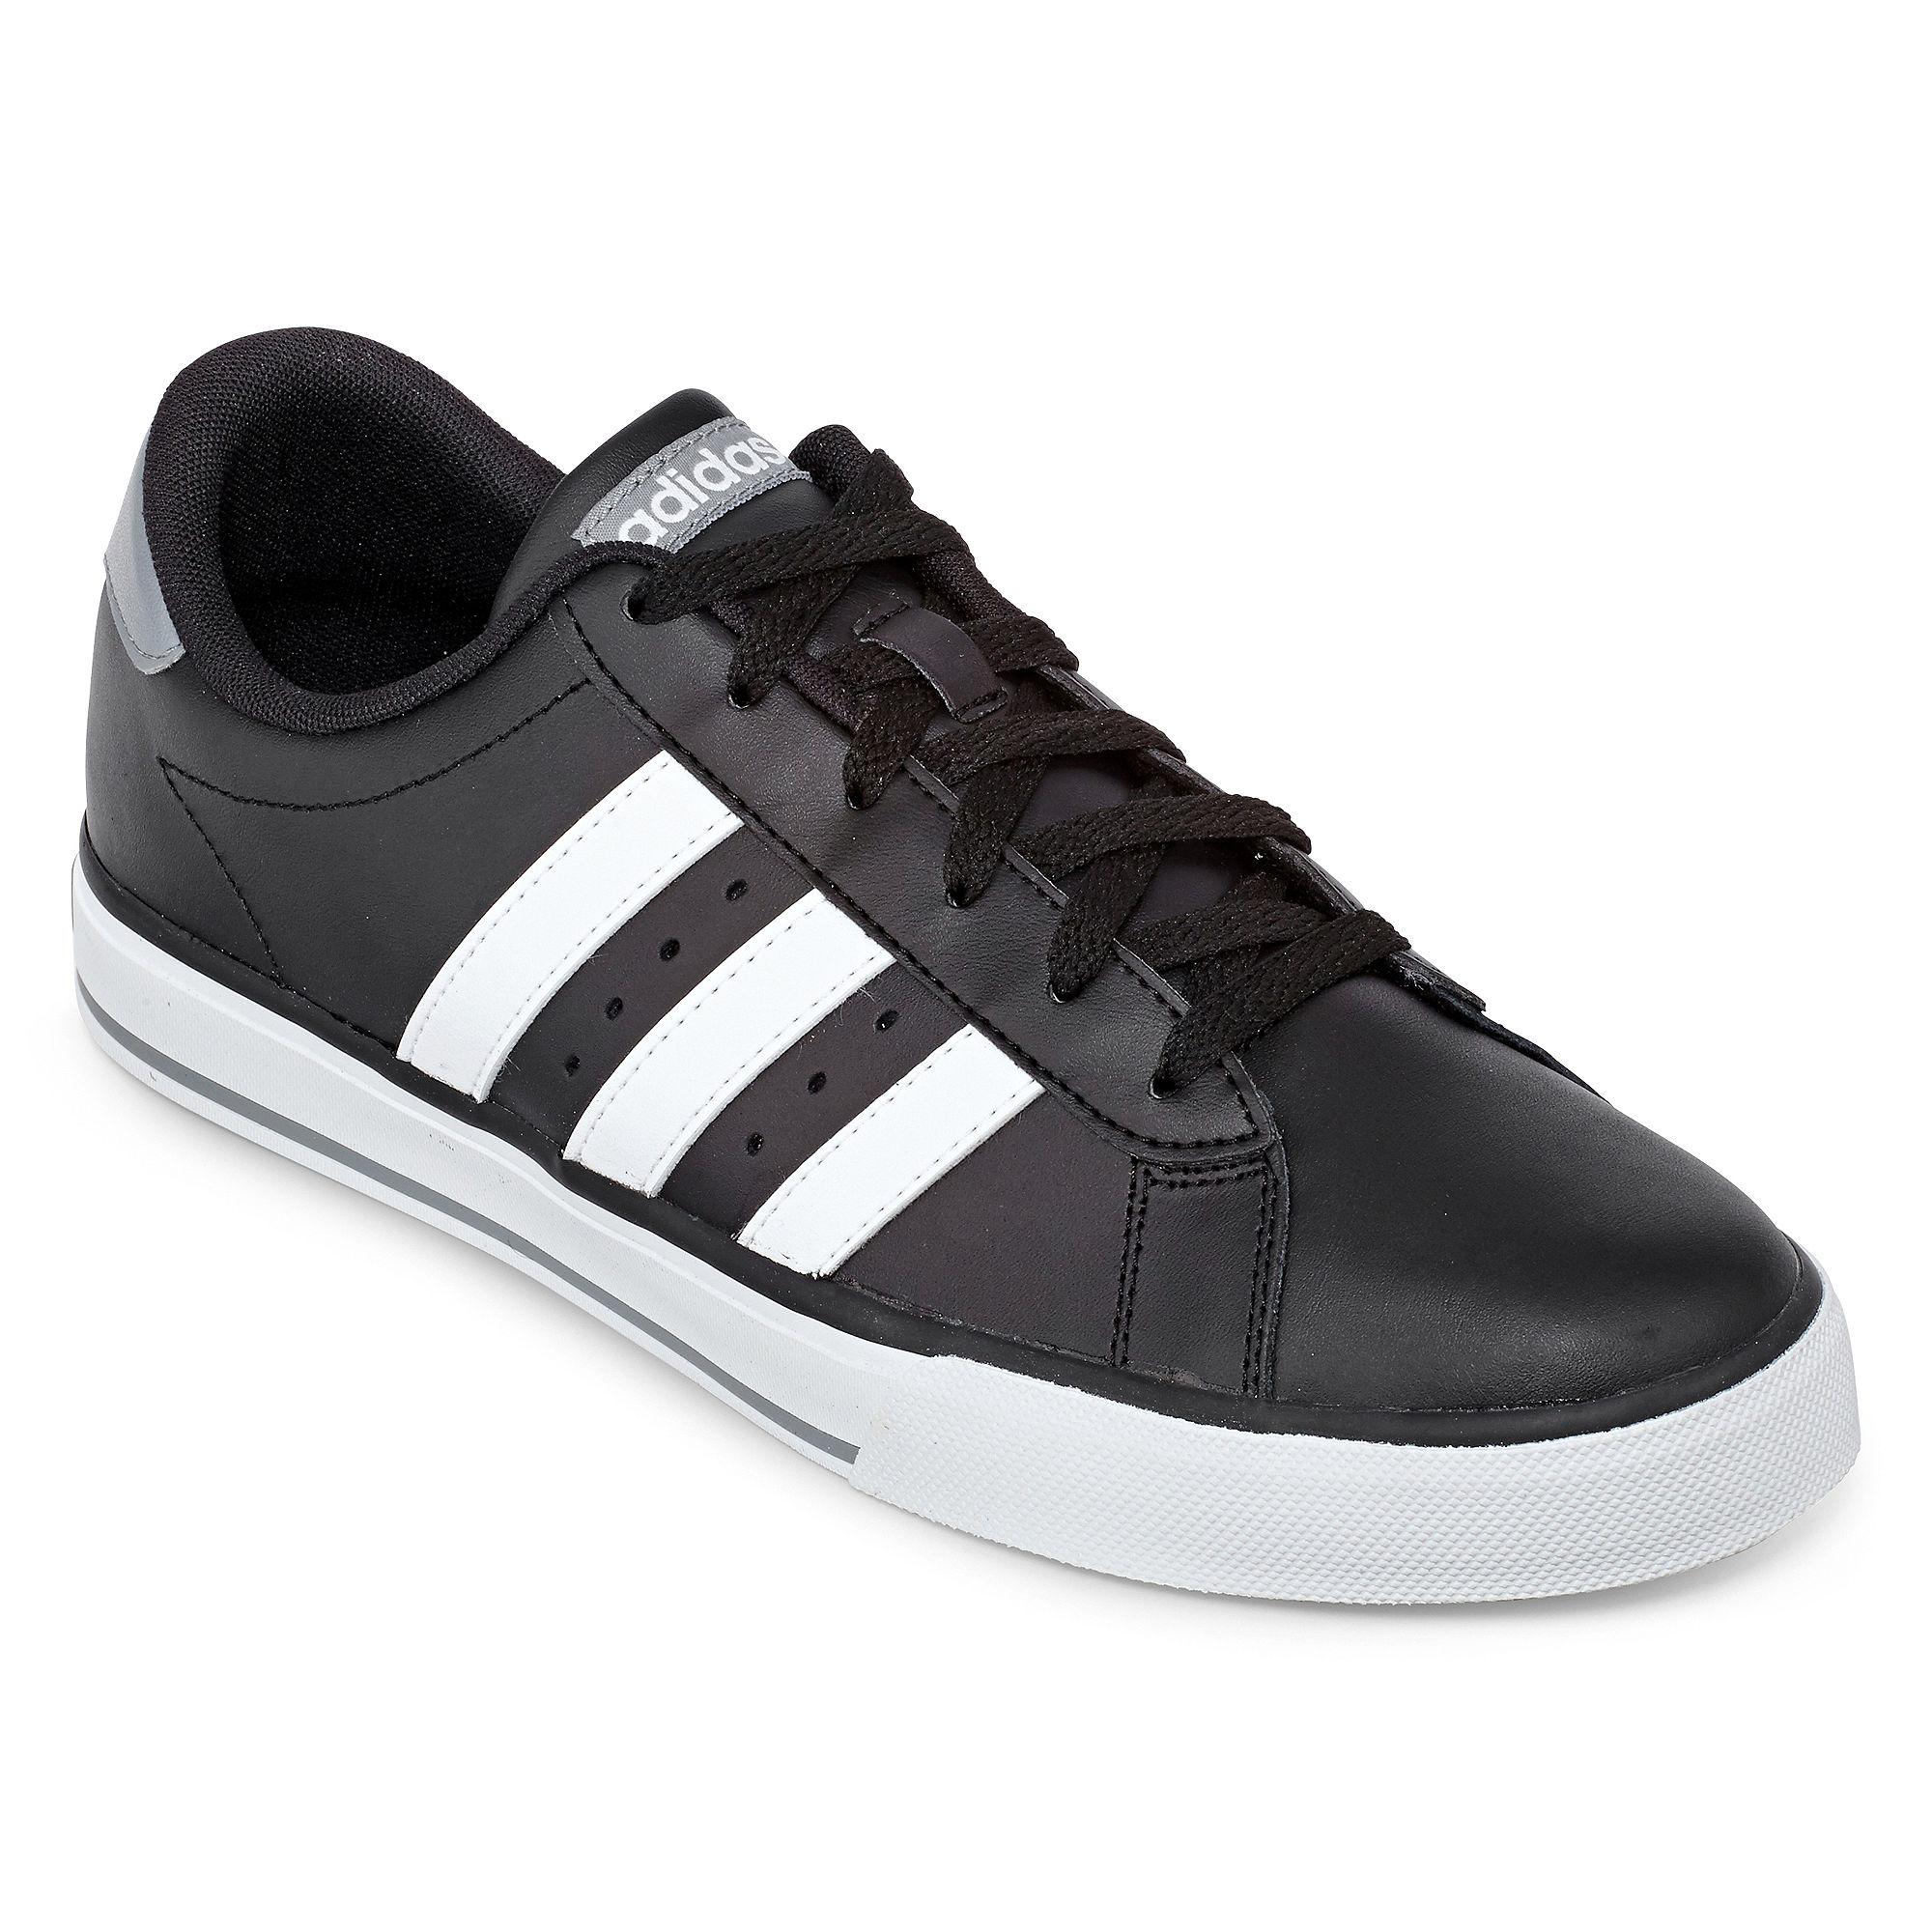 UPC 887383935316 product image for adidas Men's SE Daily Vulc Black/White/Dark  Grey